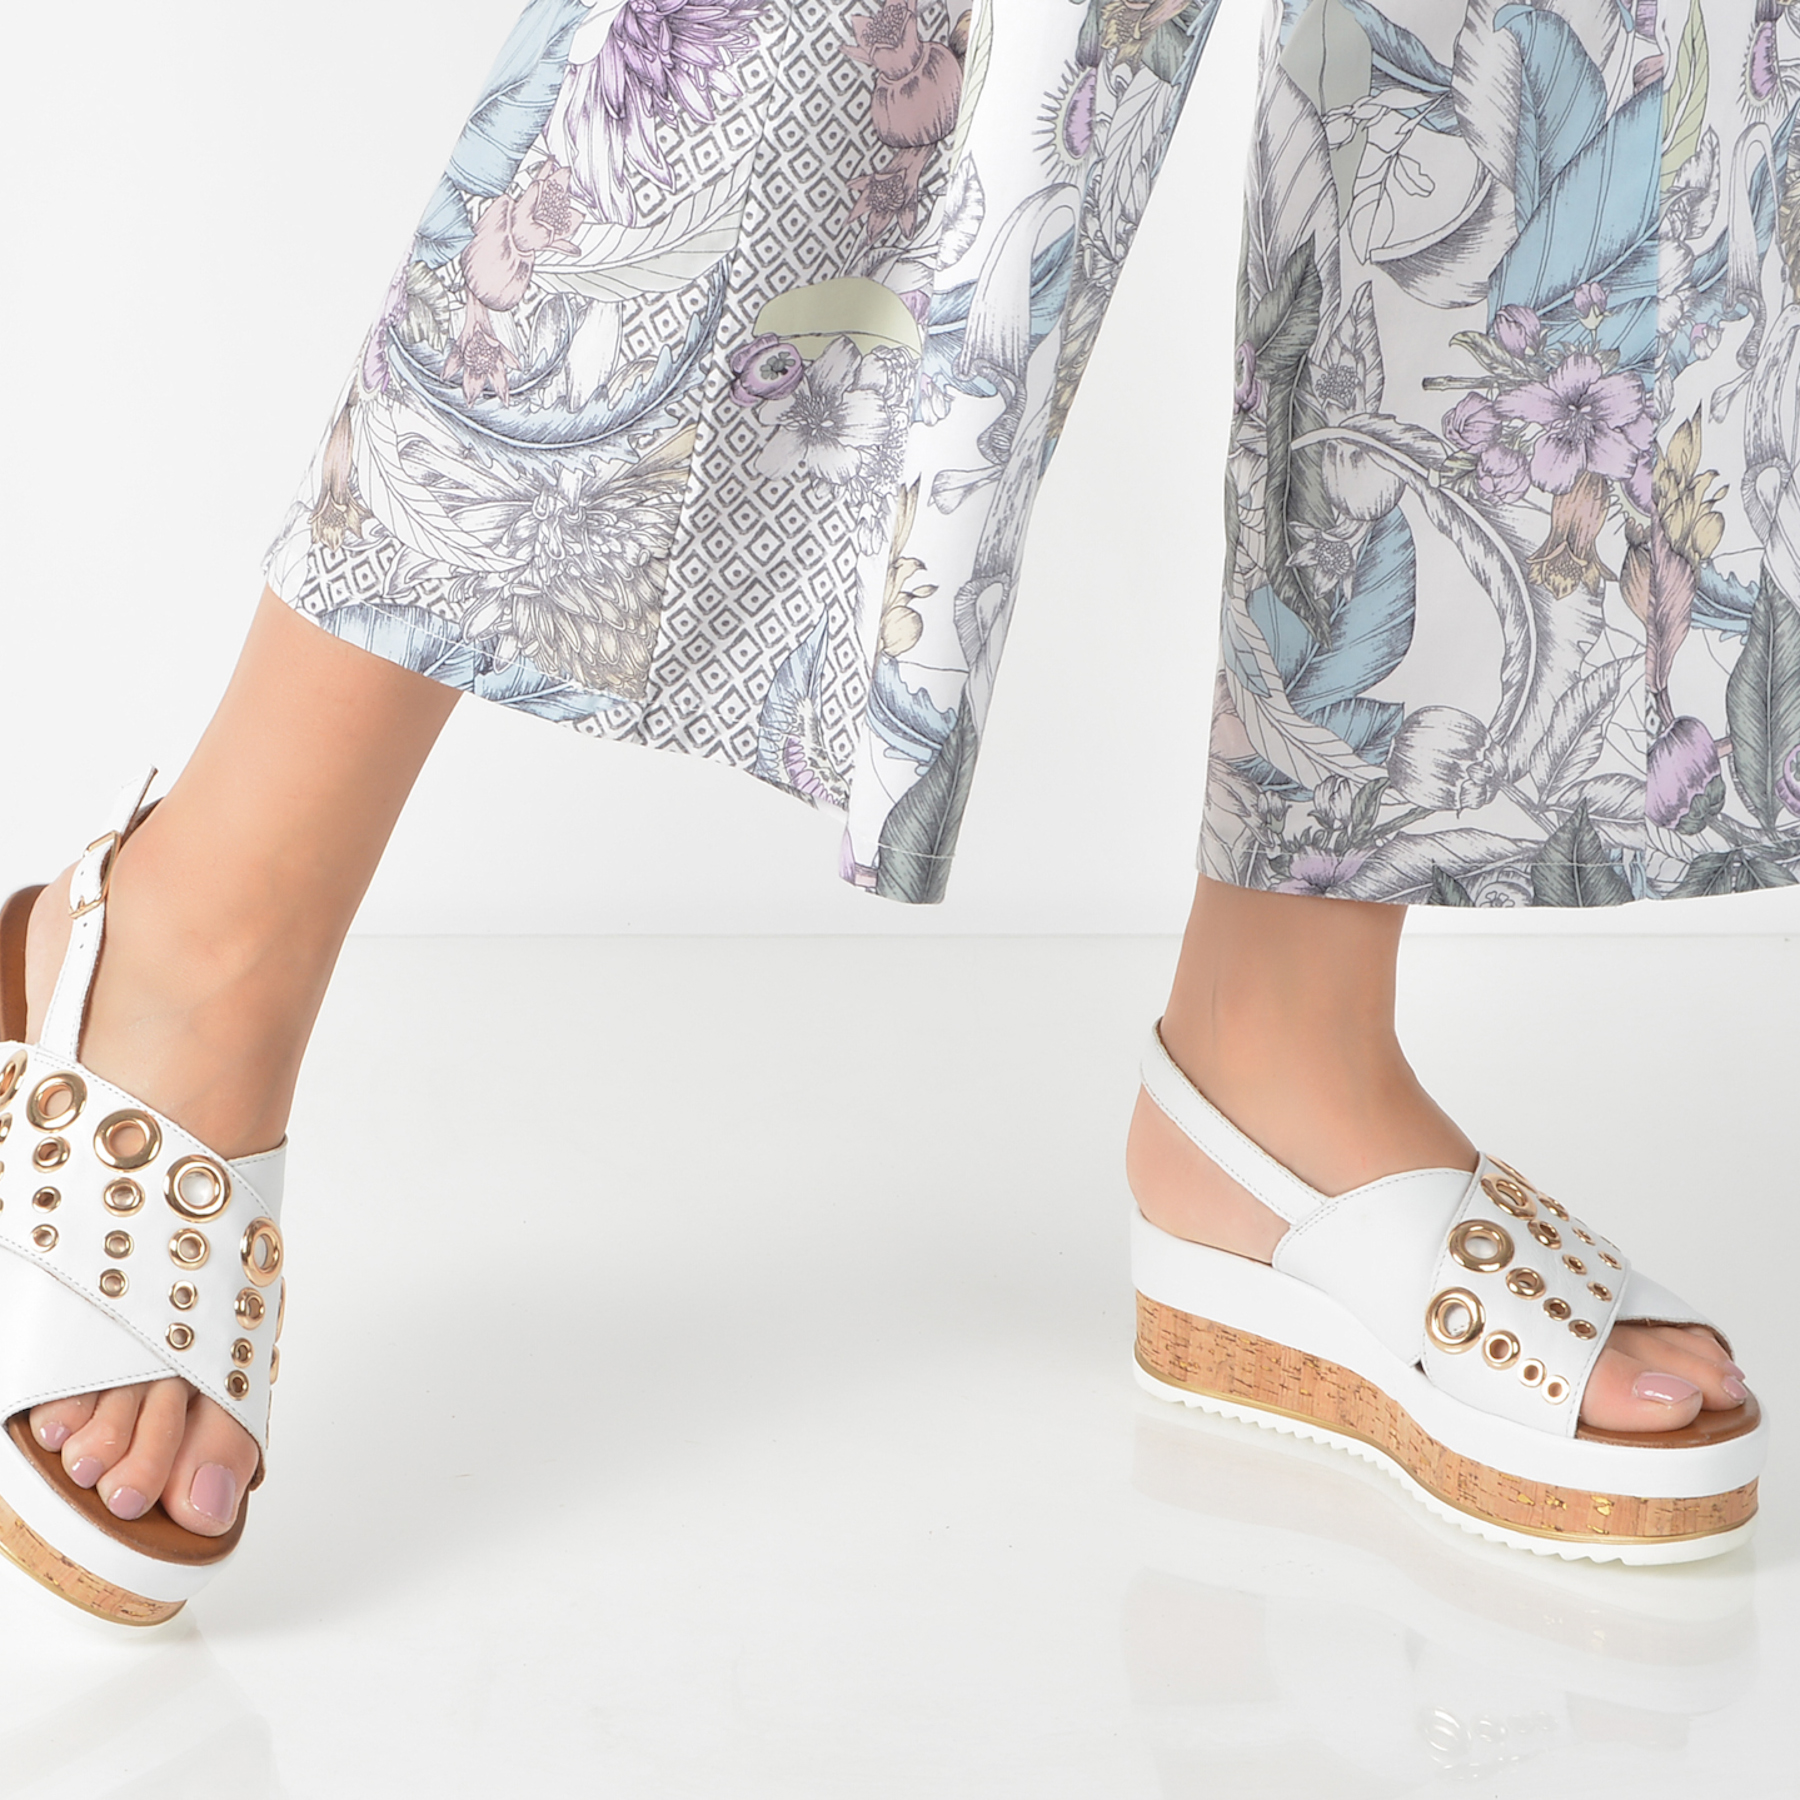 Sandale IMAGE albe, 8836, din piele naturala